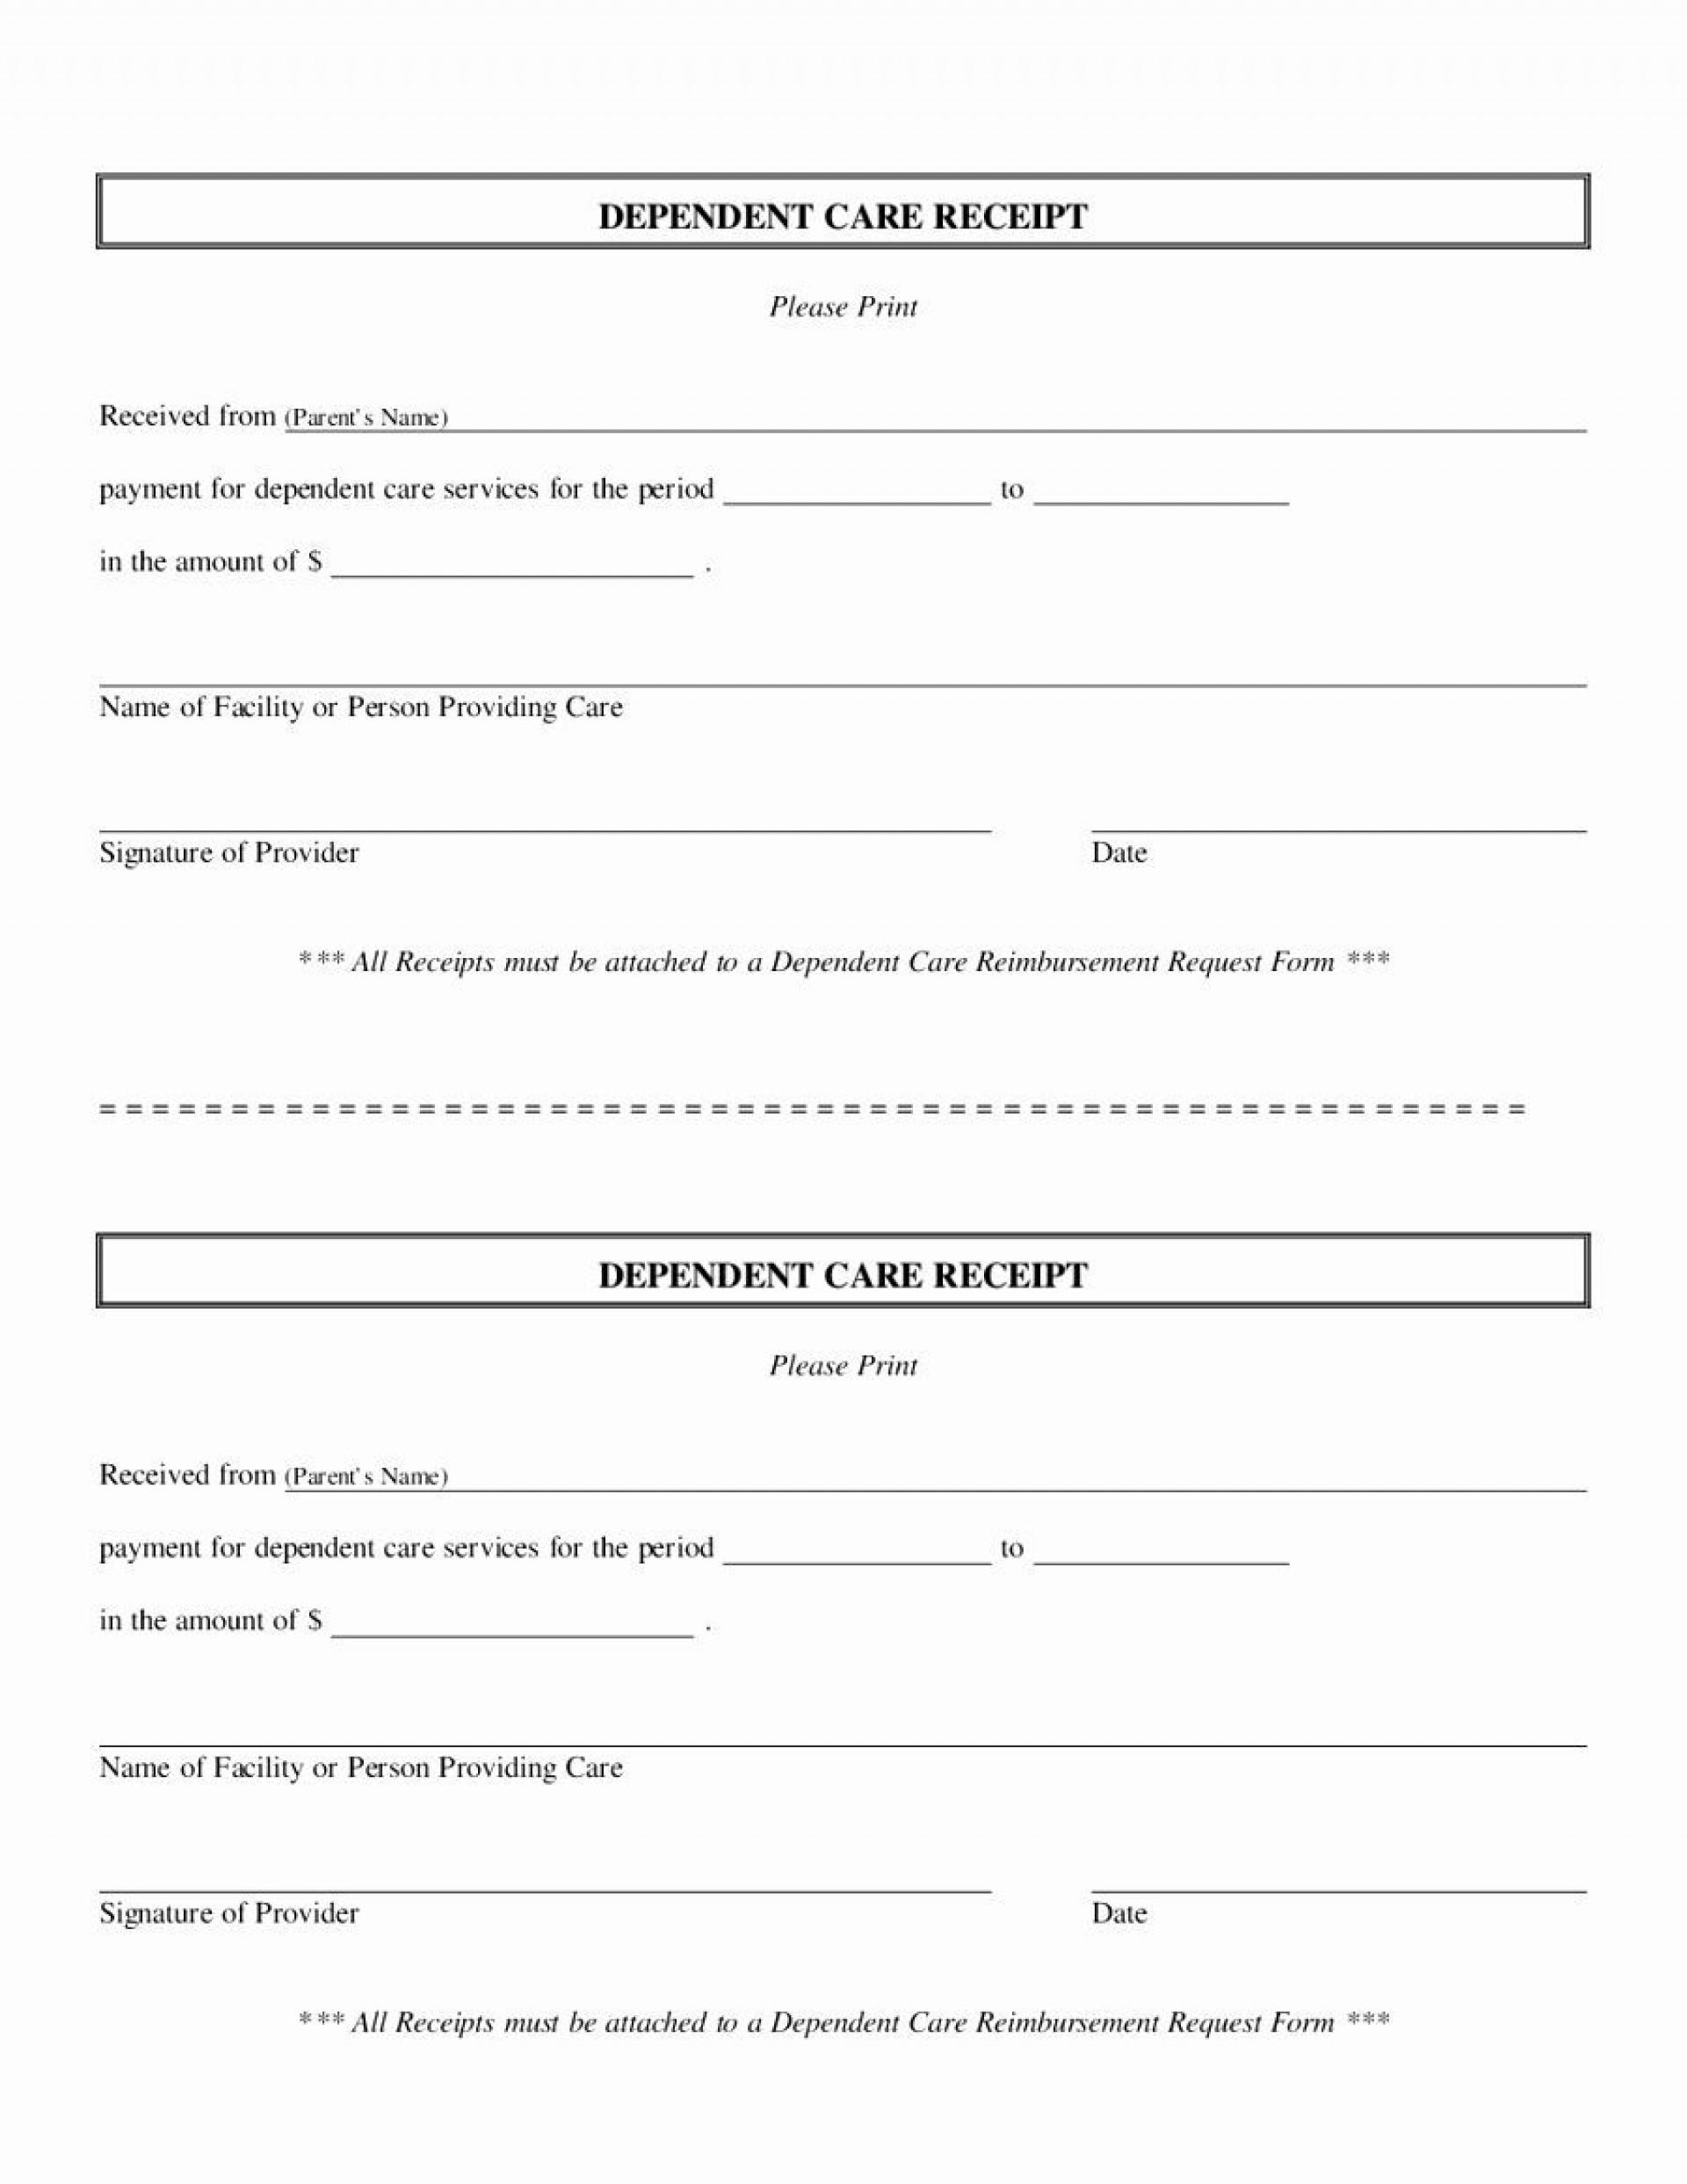 002 Striking Free Printable Receipt Template Concept  Blank Cash Microsoft Word Uk1920